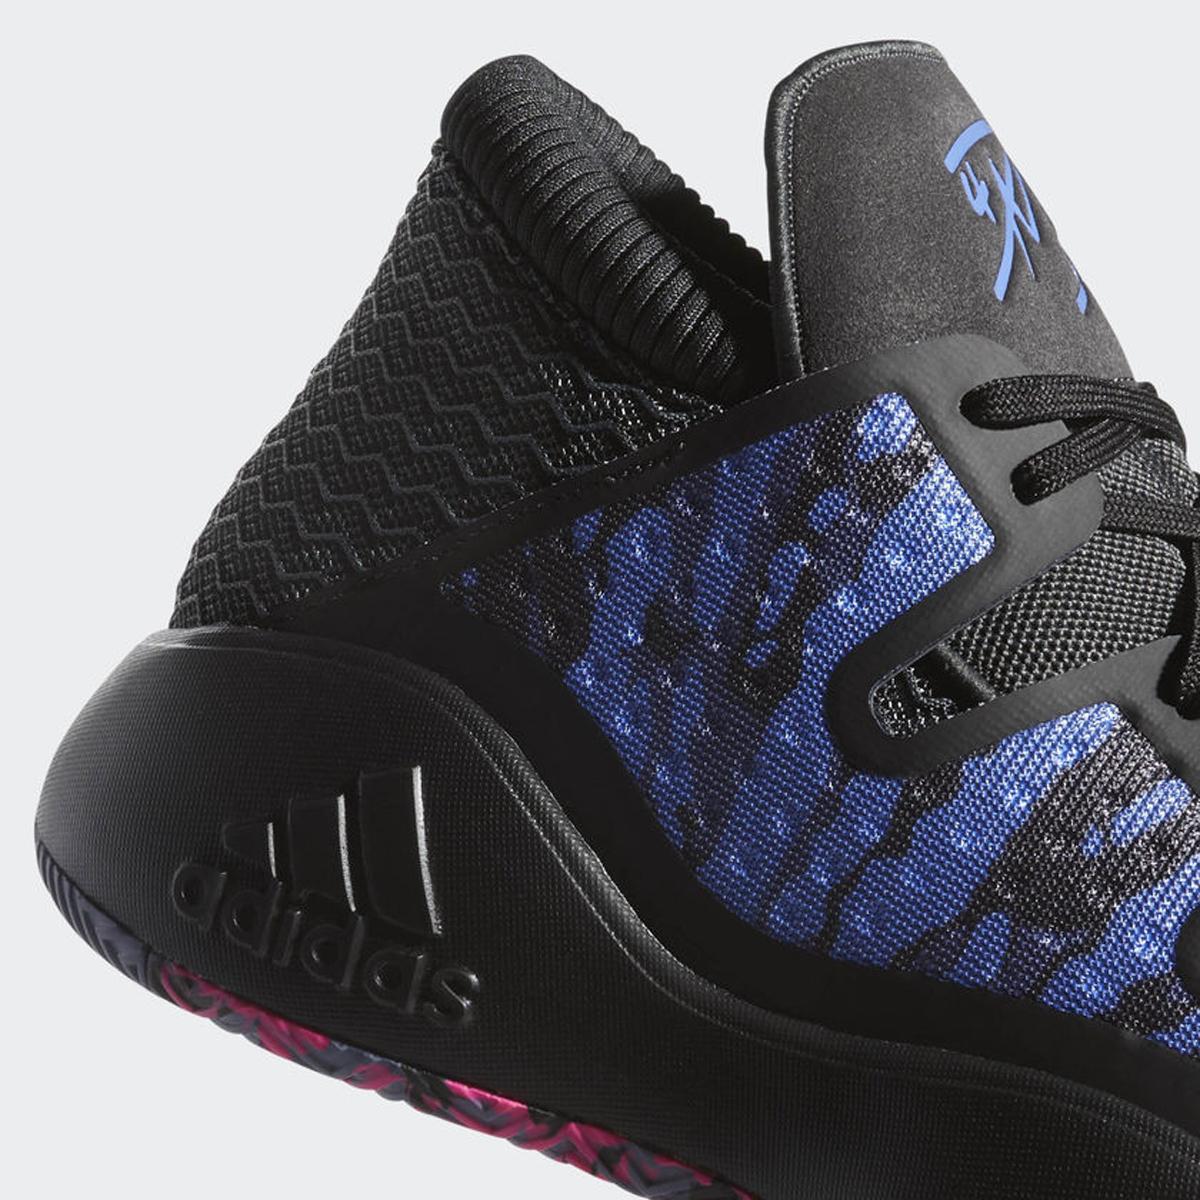 9a5b23b2b2a2 adidas-Pro-Vision-Donovan-Mitchell-PE-Black-5 - WearTesters